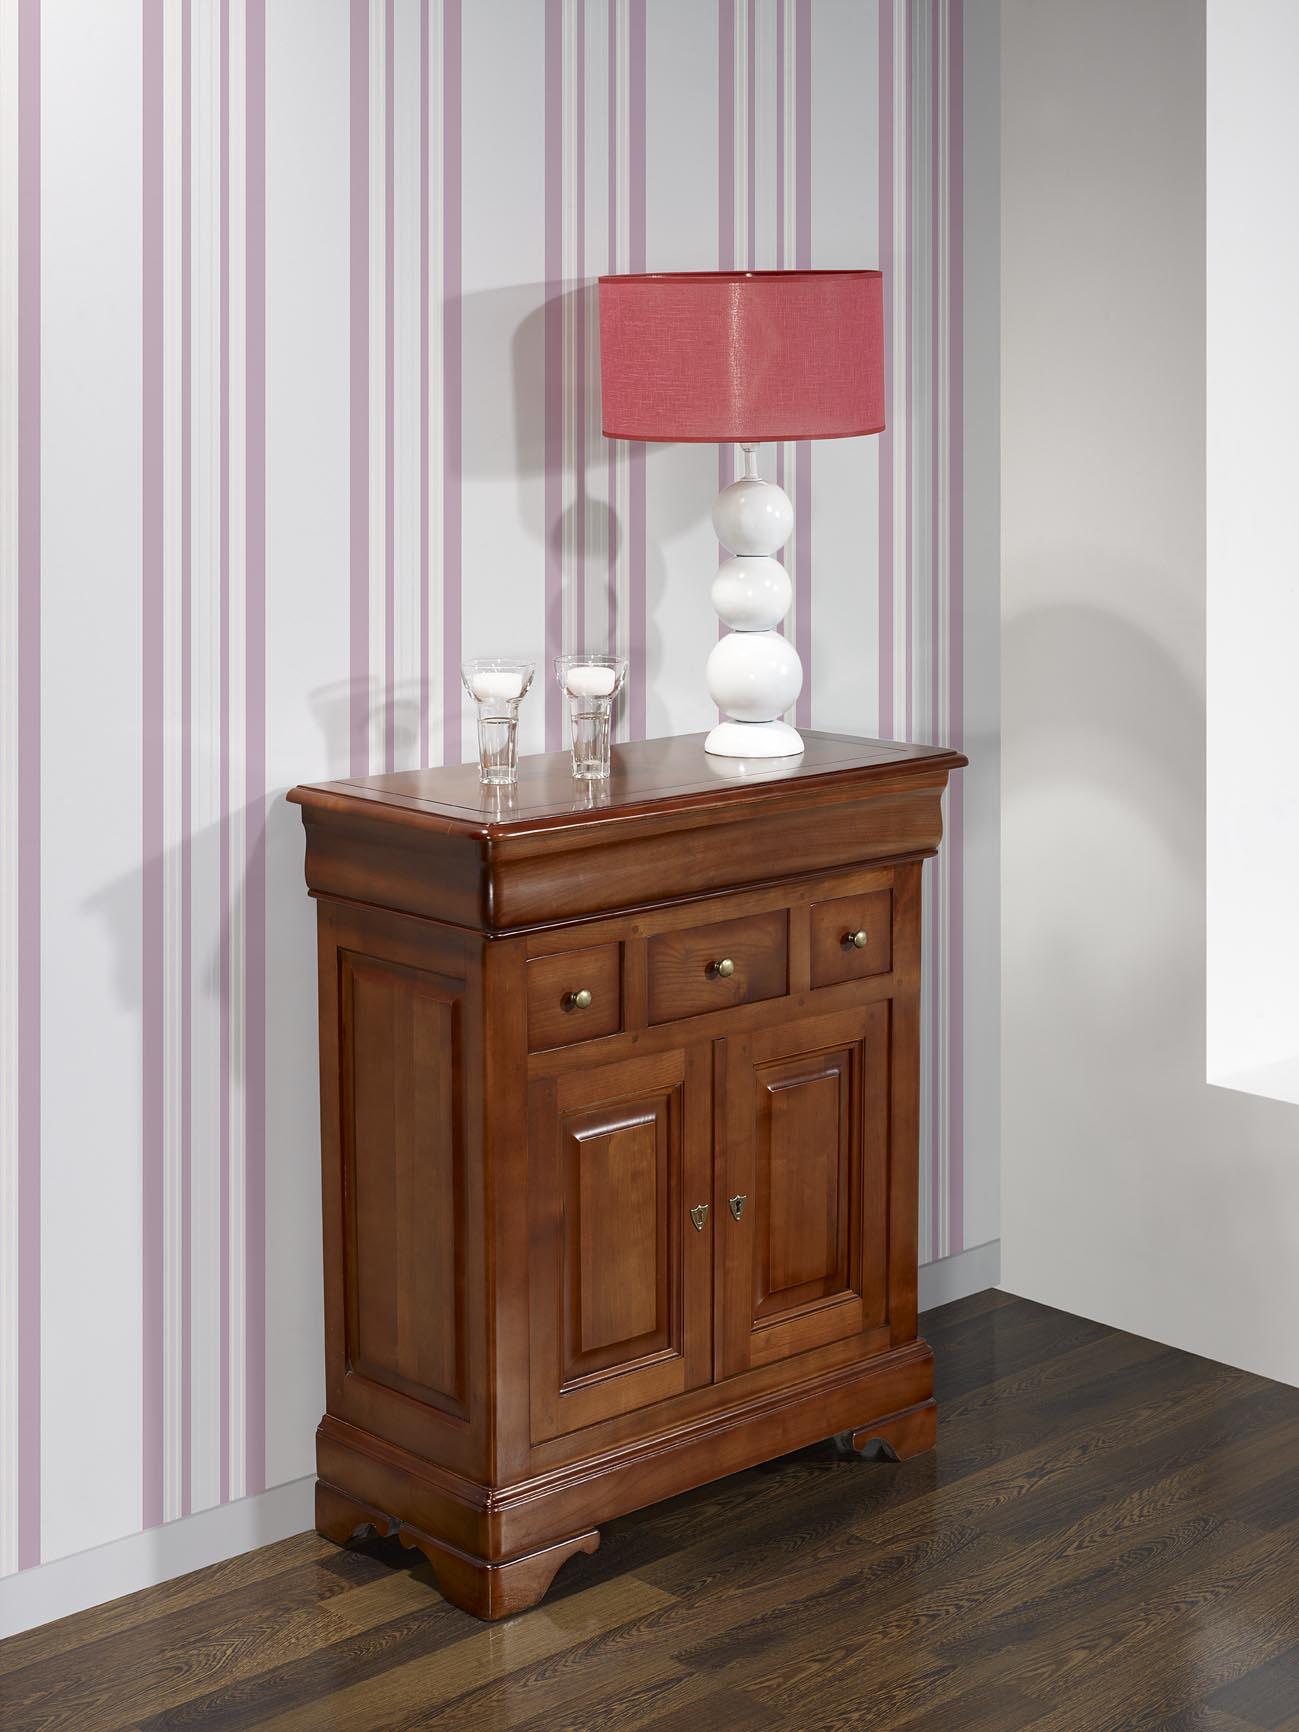 petit buffet maria jos e en merisier massif de style louis philippe meuble. Black Bedroom Furniture Sets. Home Design Ideas